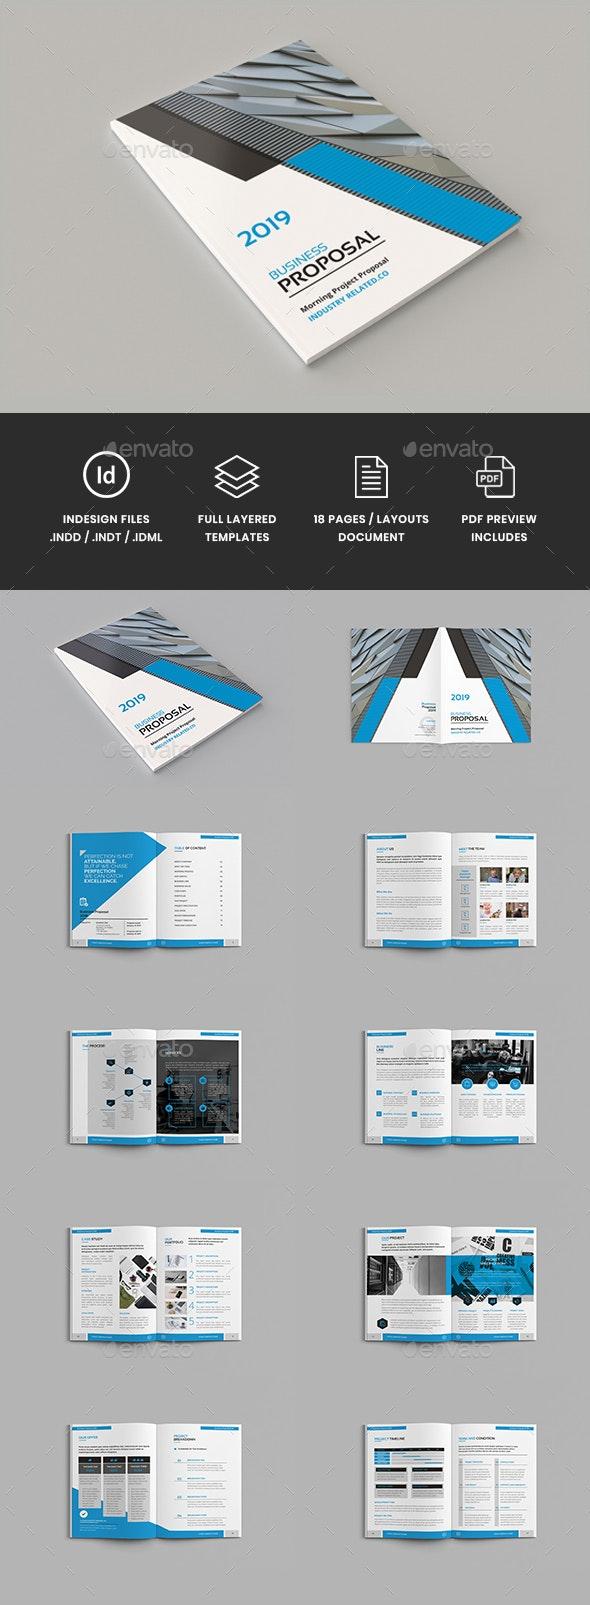 Yuzn - A4 Proposal Brochure Template - Corporate Brochures